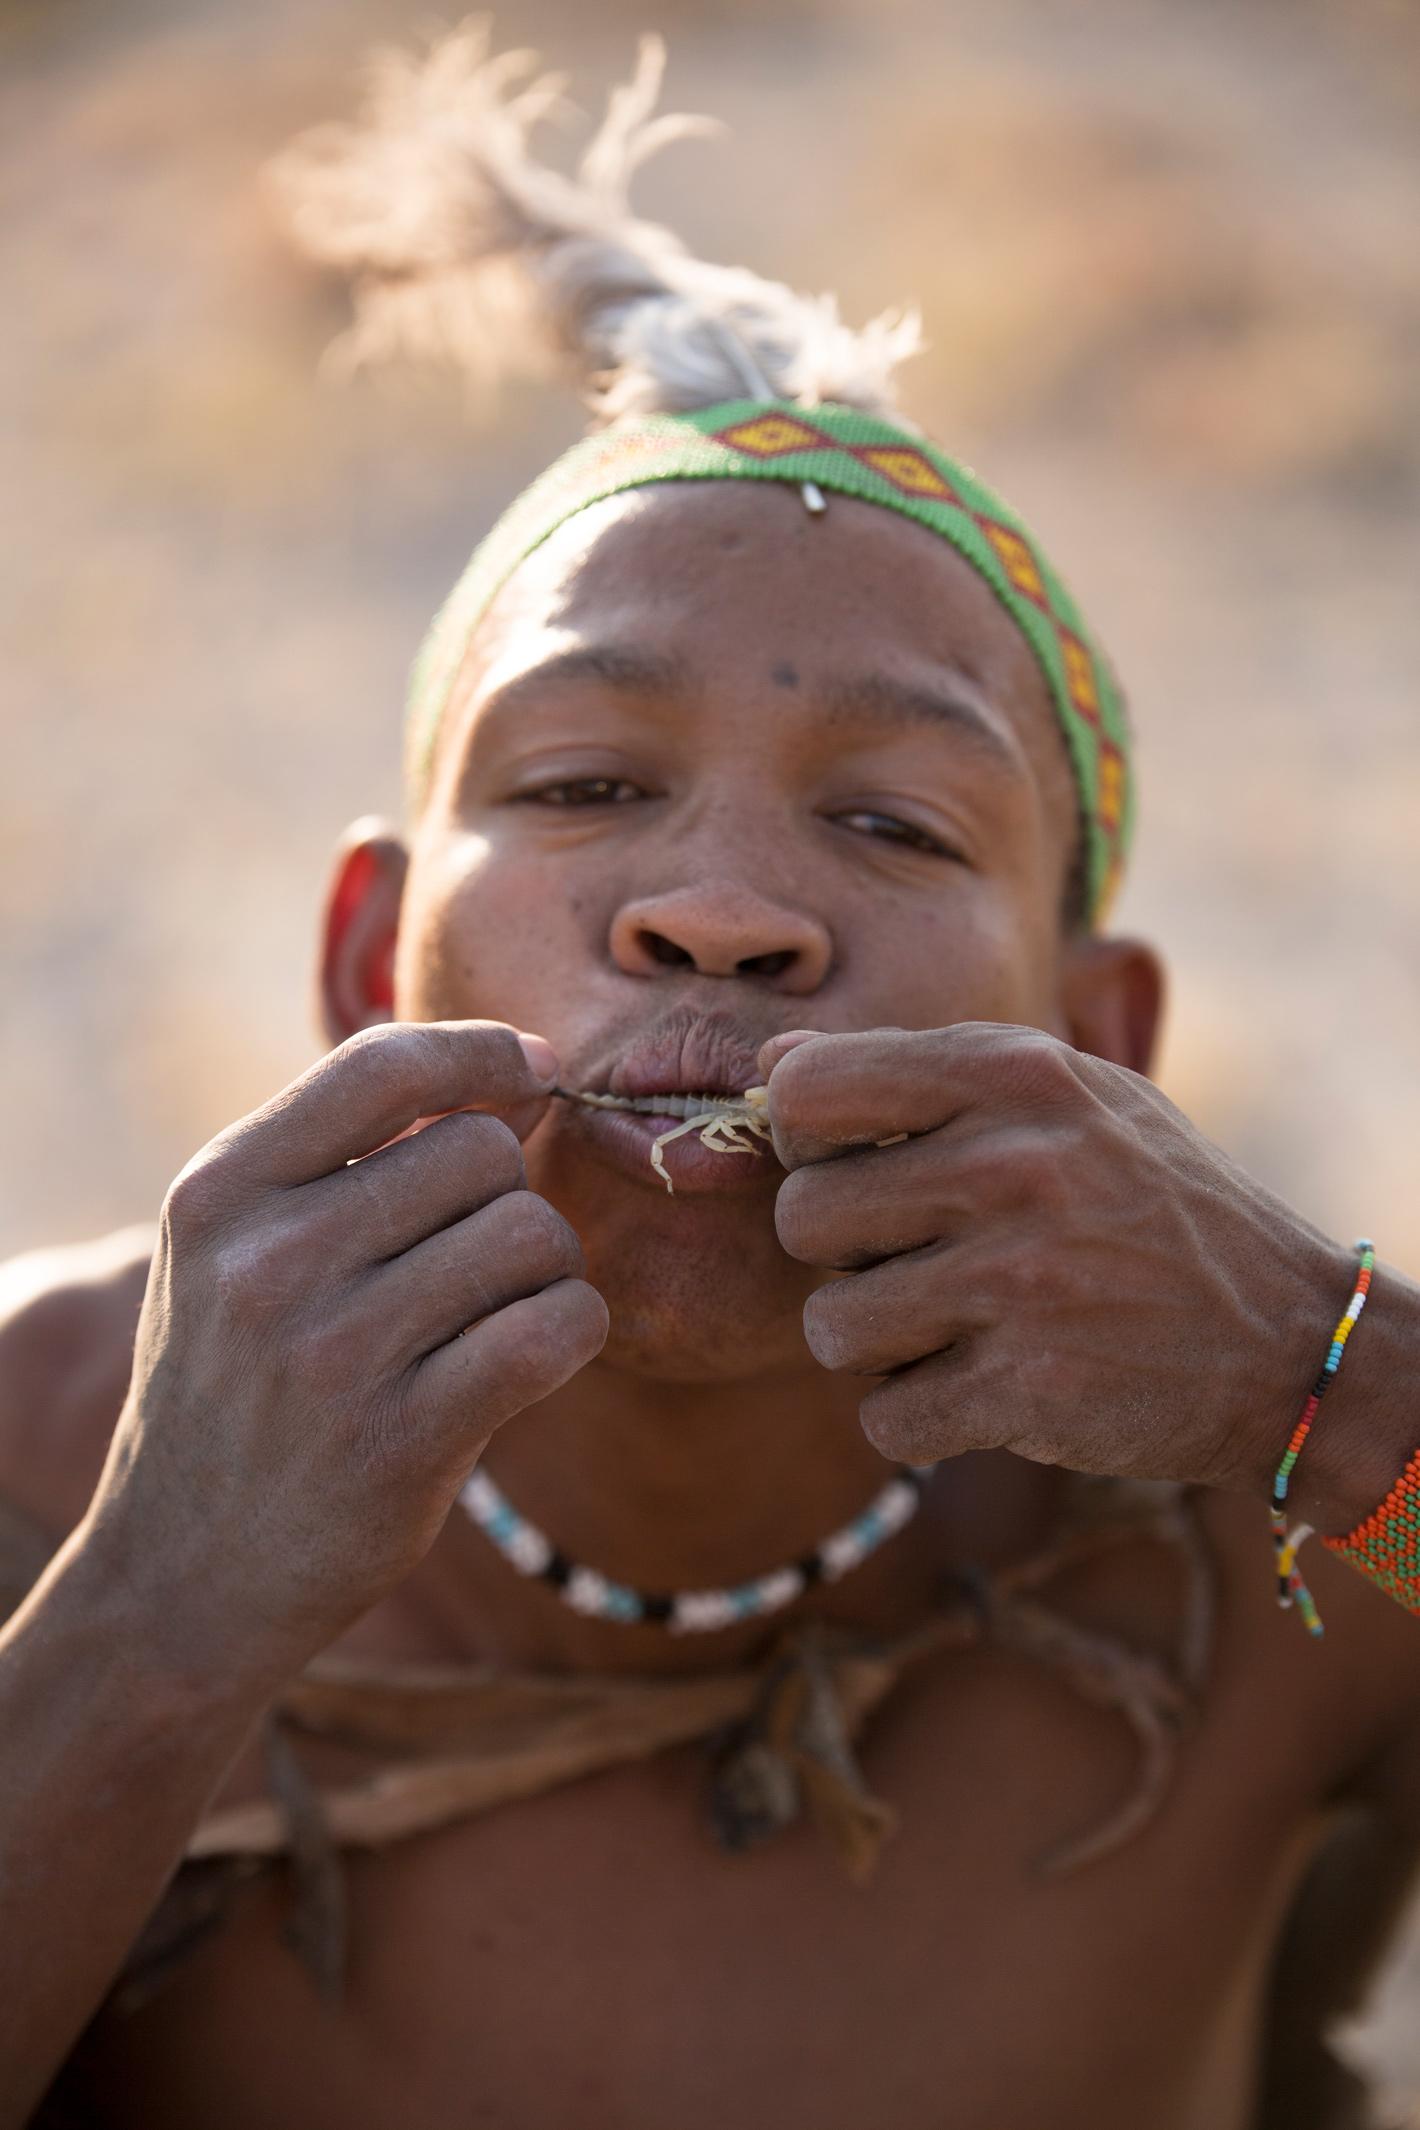 bushman eats scorpion